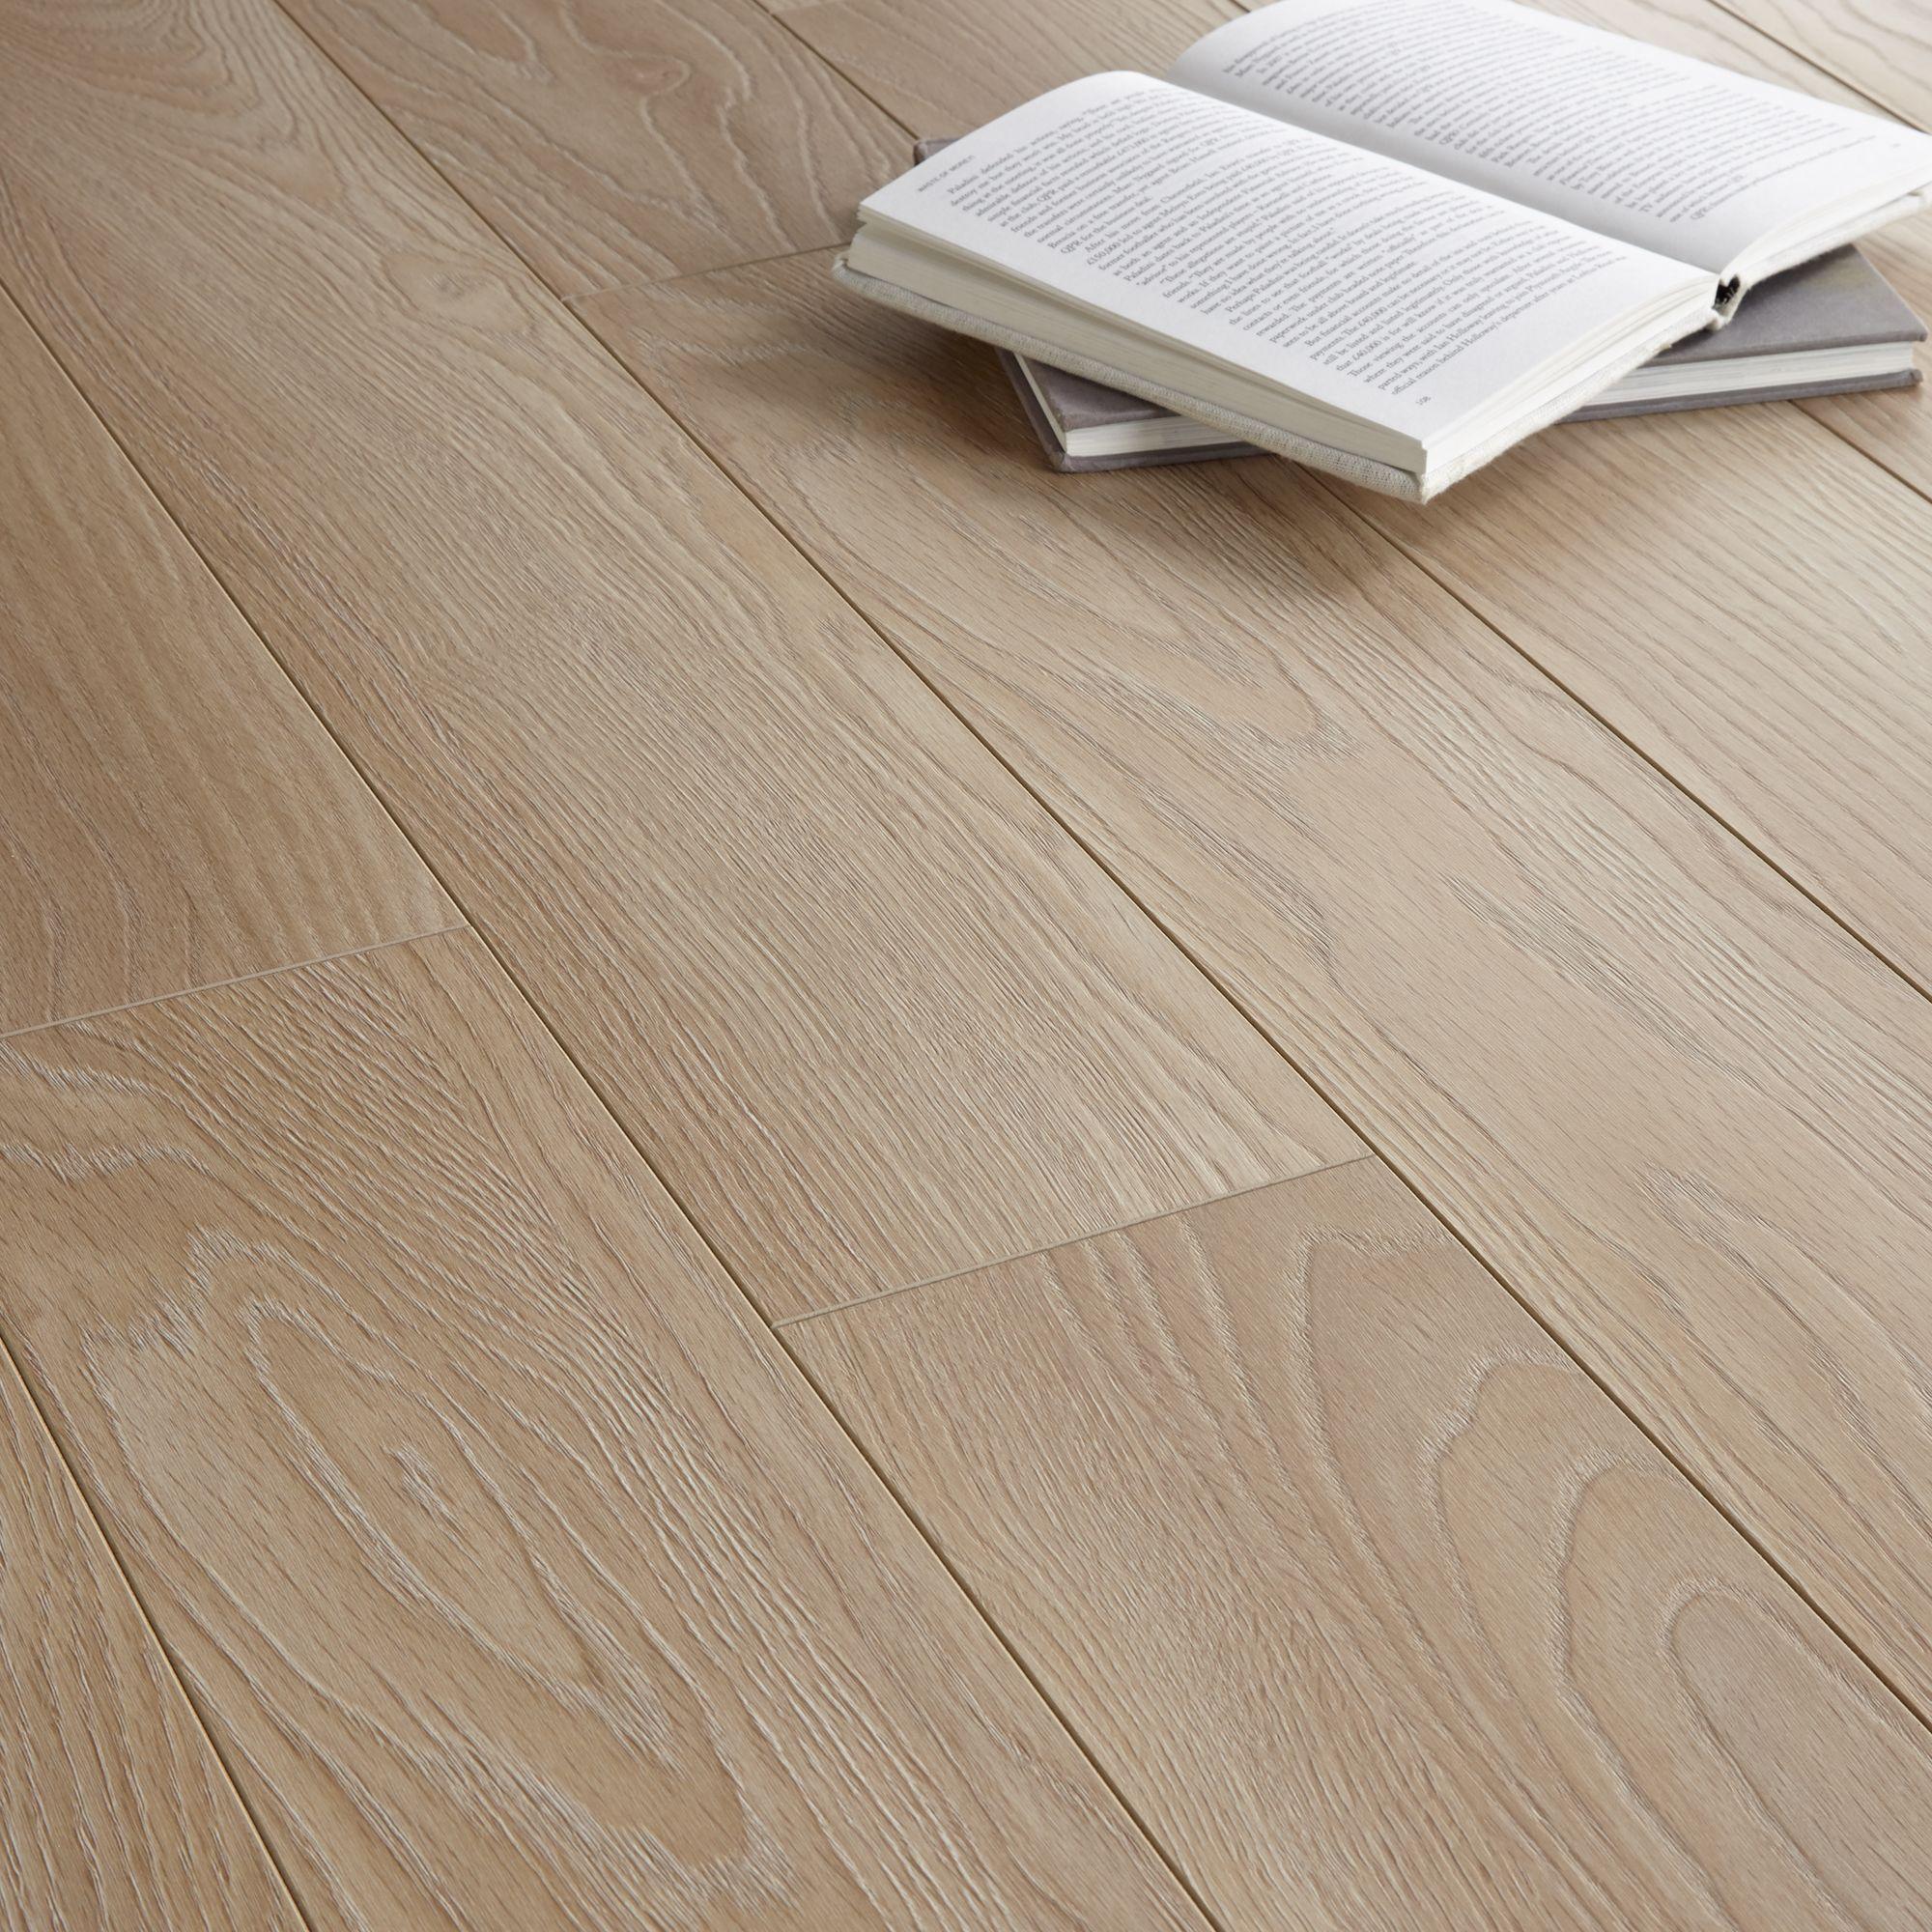 Oak laminate flooring diy for Diy laminate flooring